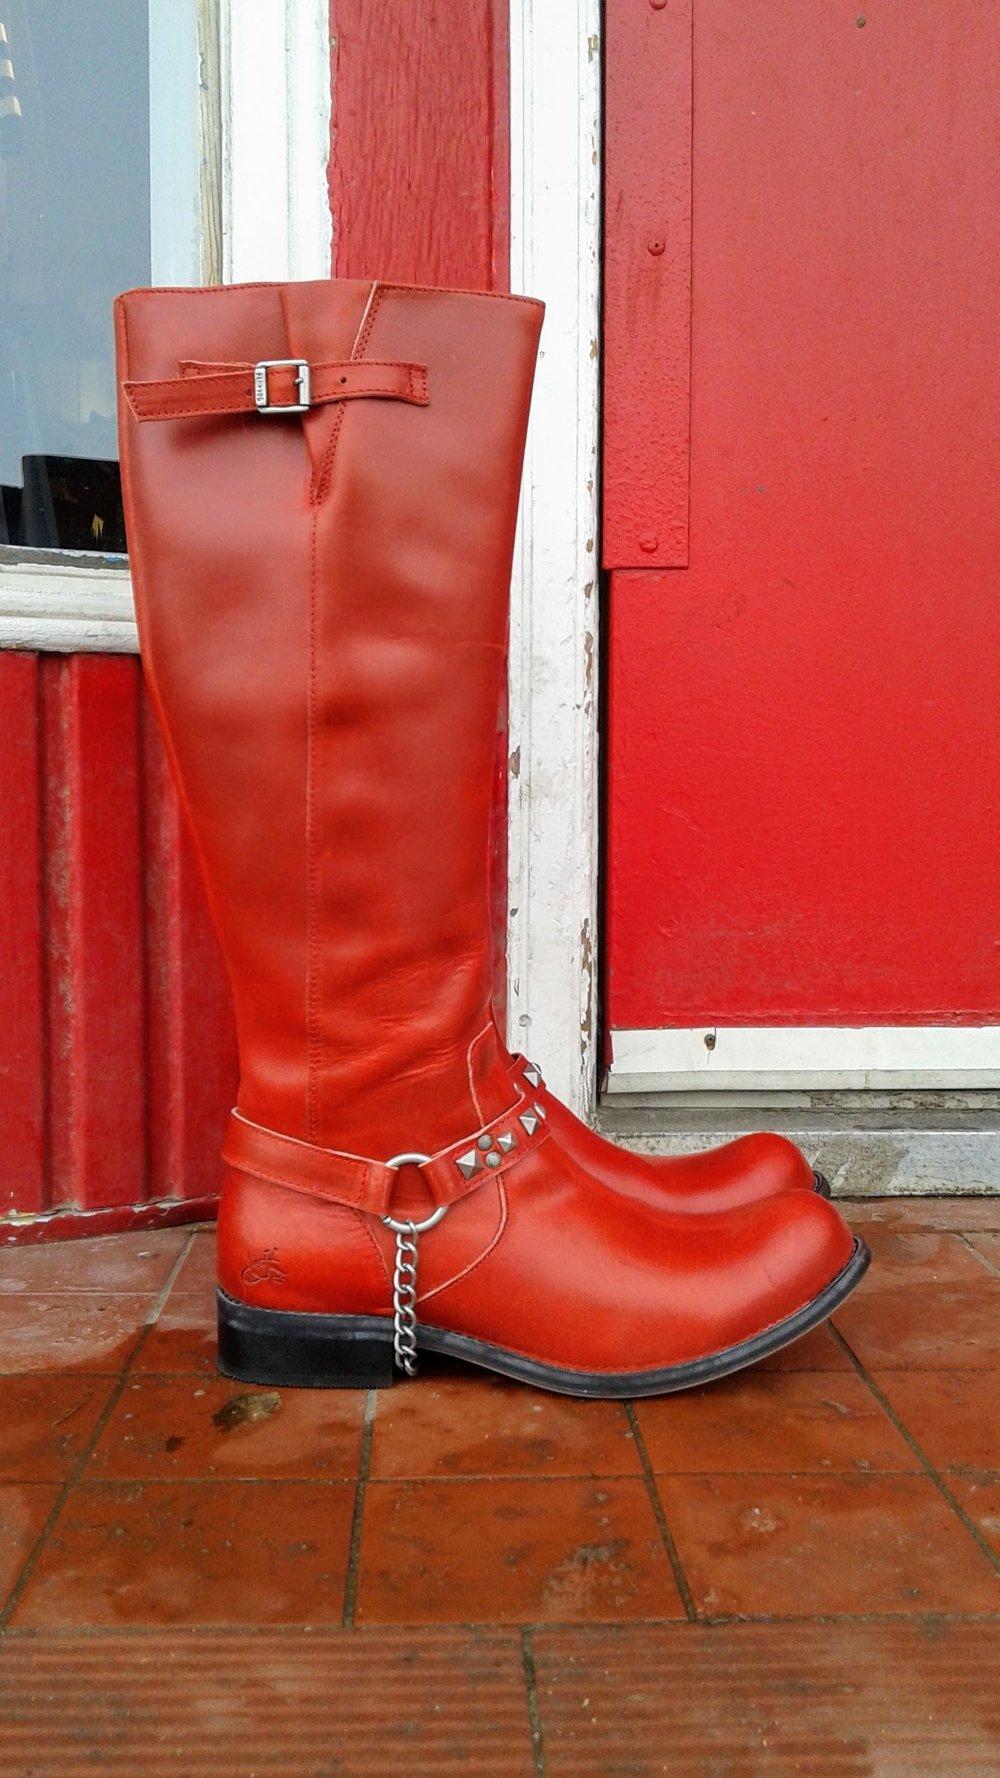 Fluevog boot; S12, $225